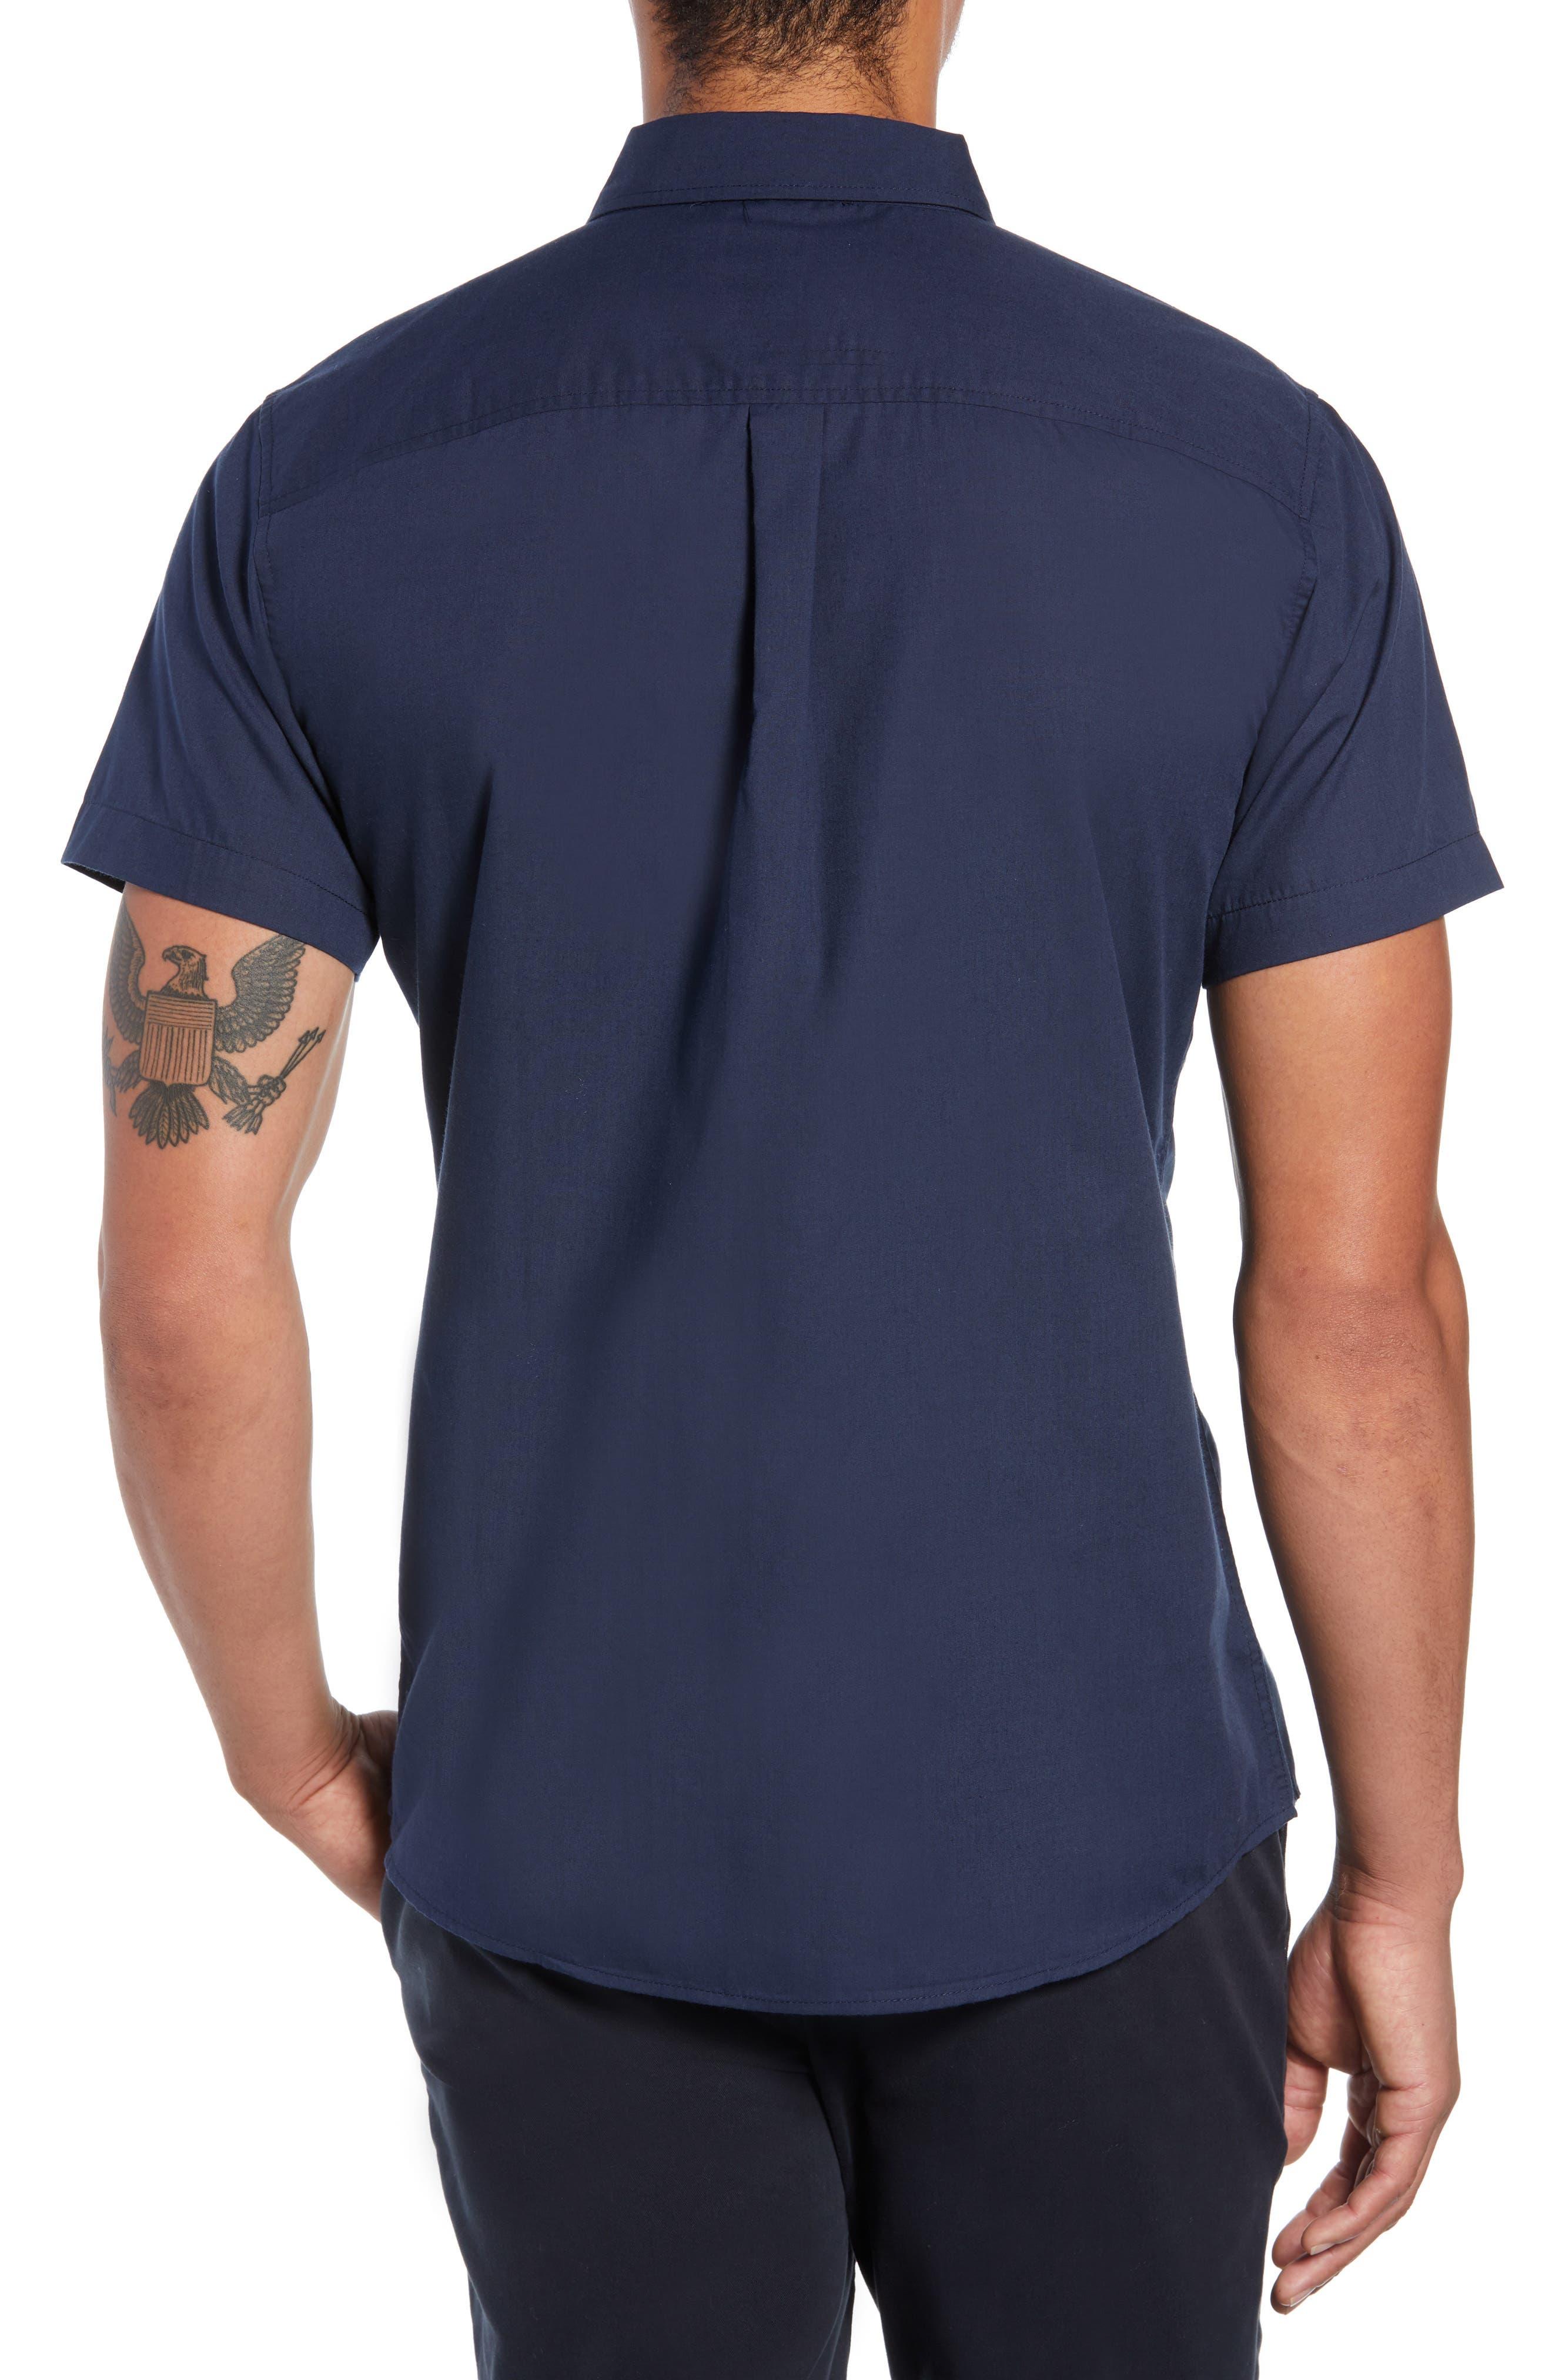 Howl Woven Shirt,                             Alternate thumbnail 2, color,                             NAVY